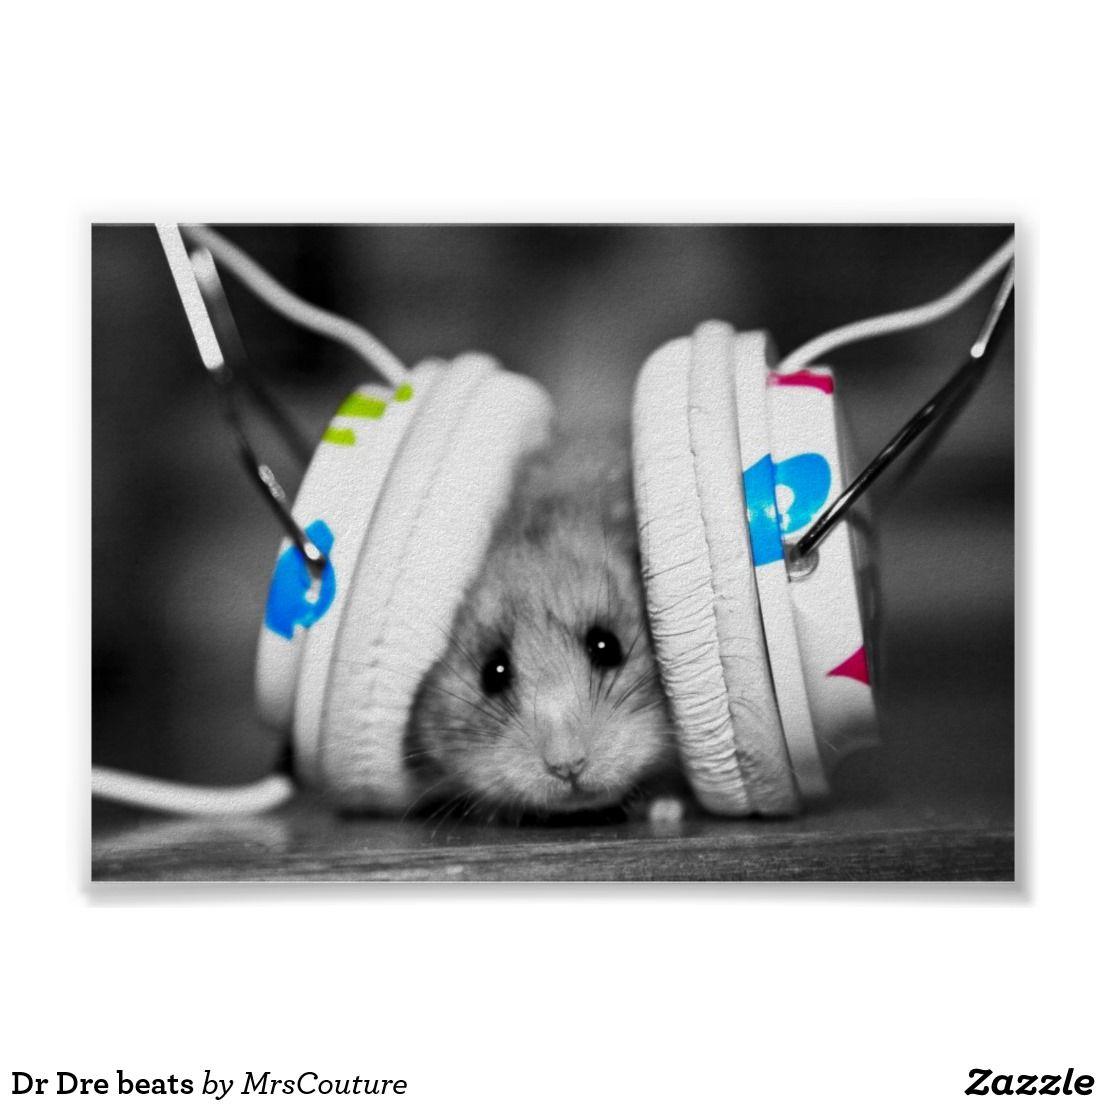 Dr Dre Beats Poster Zazzle Com Cute Hamsters Funny Animals Hamster